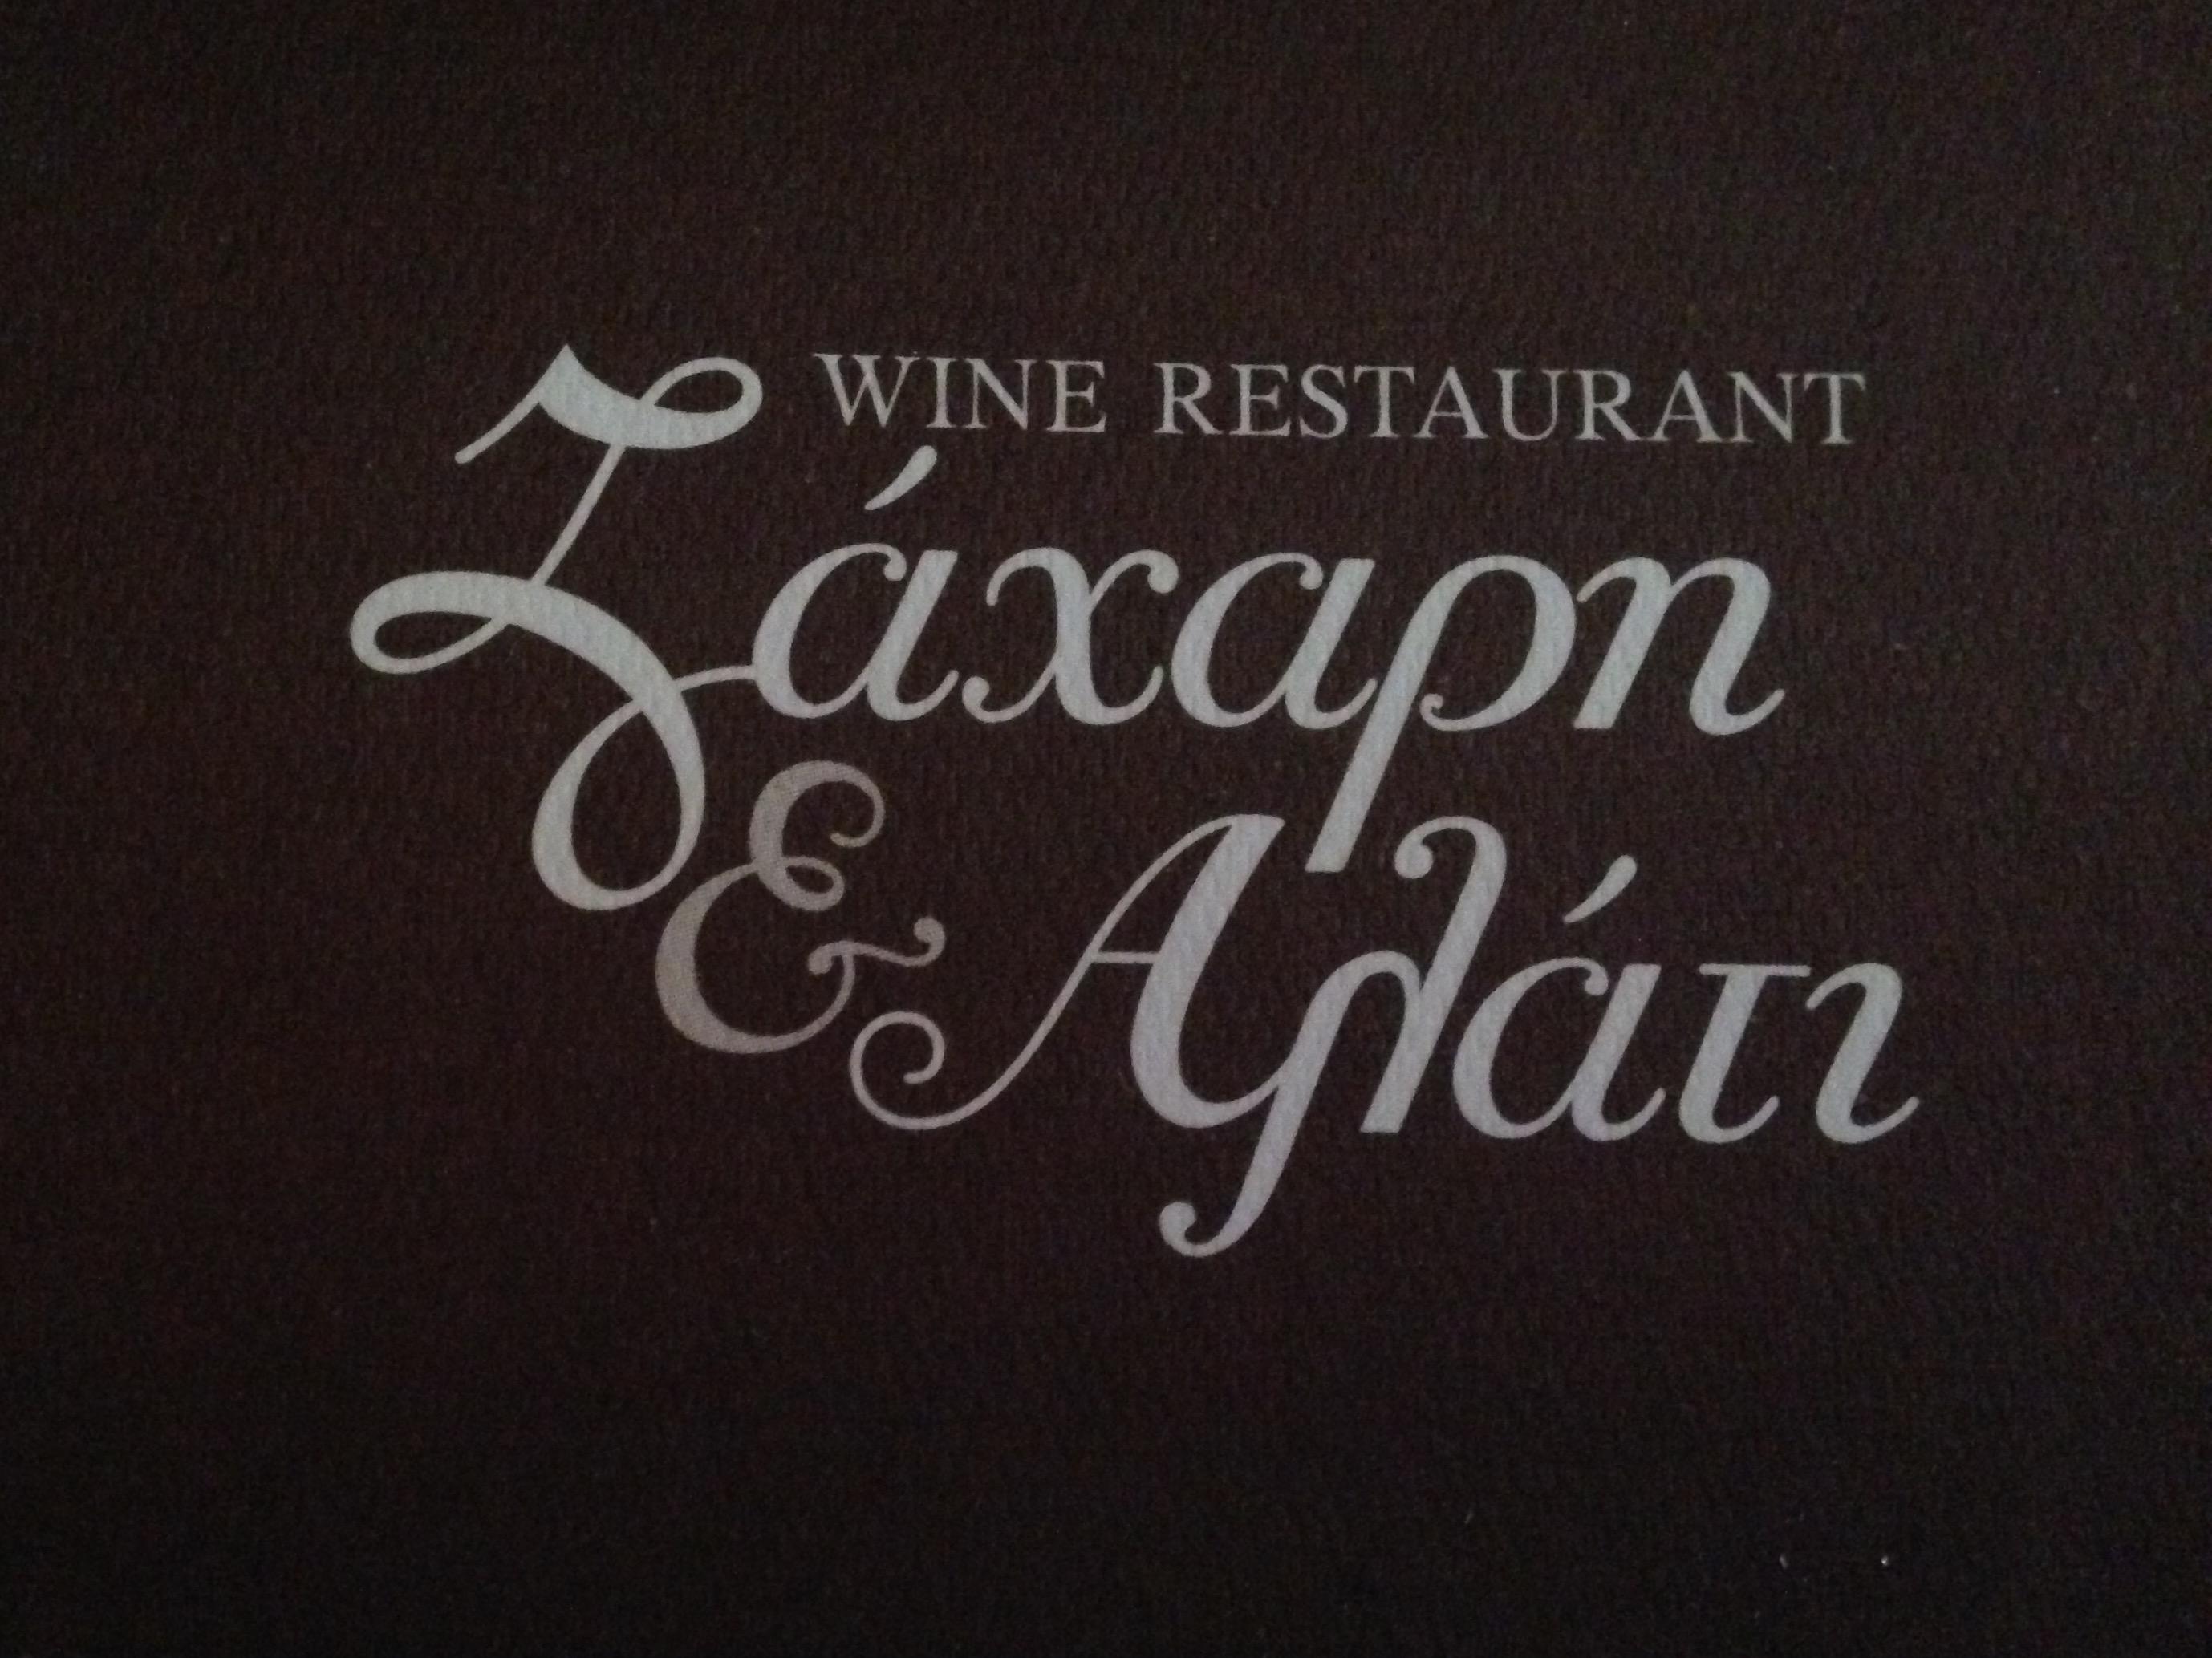 zaxari-ki-alati-wine-restaurant